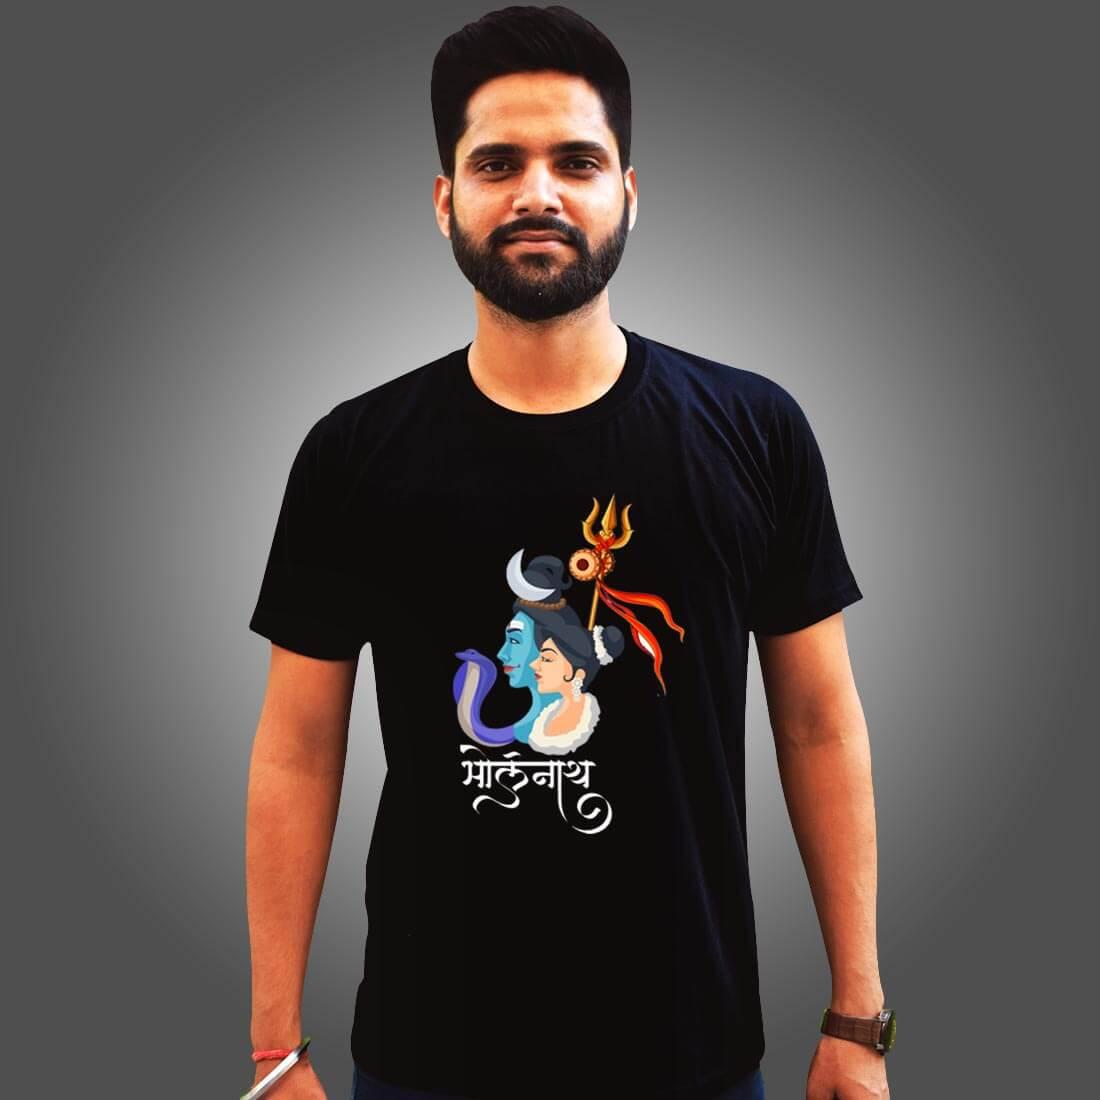 Bholenath with Parvati Images Printed Black T-Shirt for Men